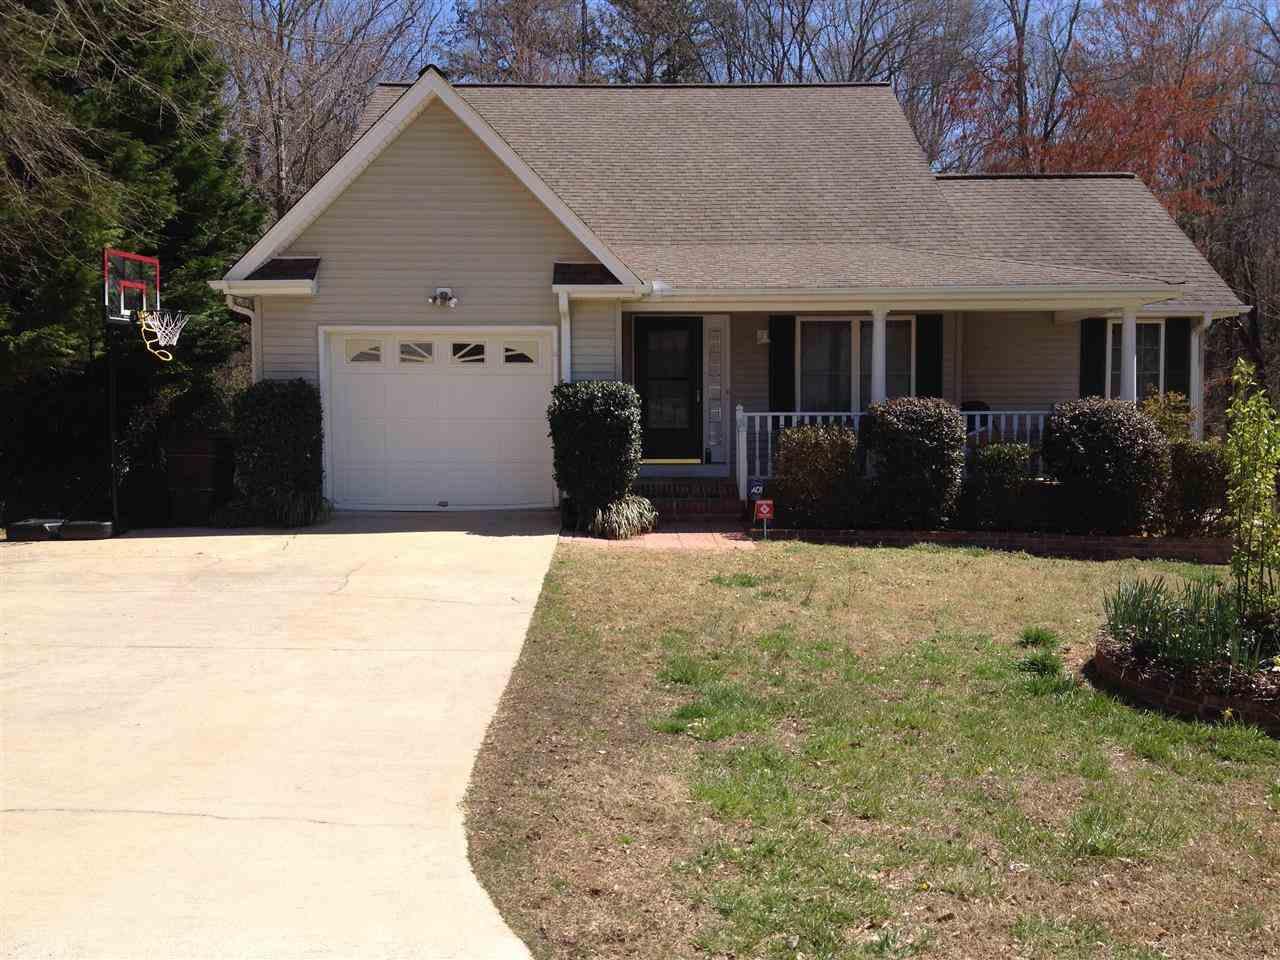 Rental Homes for Rent, ListingId:29602990, location: 124 Grand Oak Circle Pendleton 29670